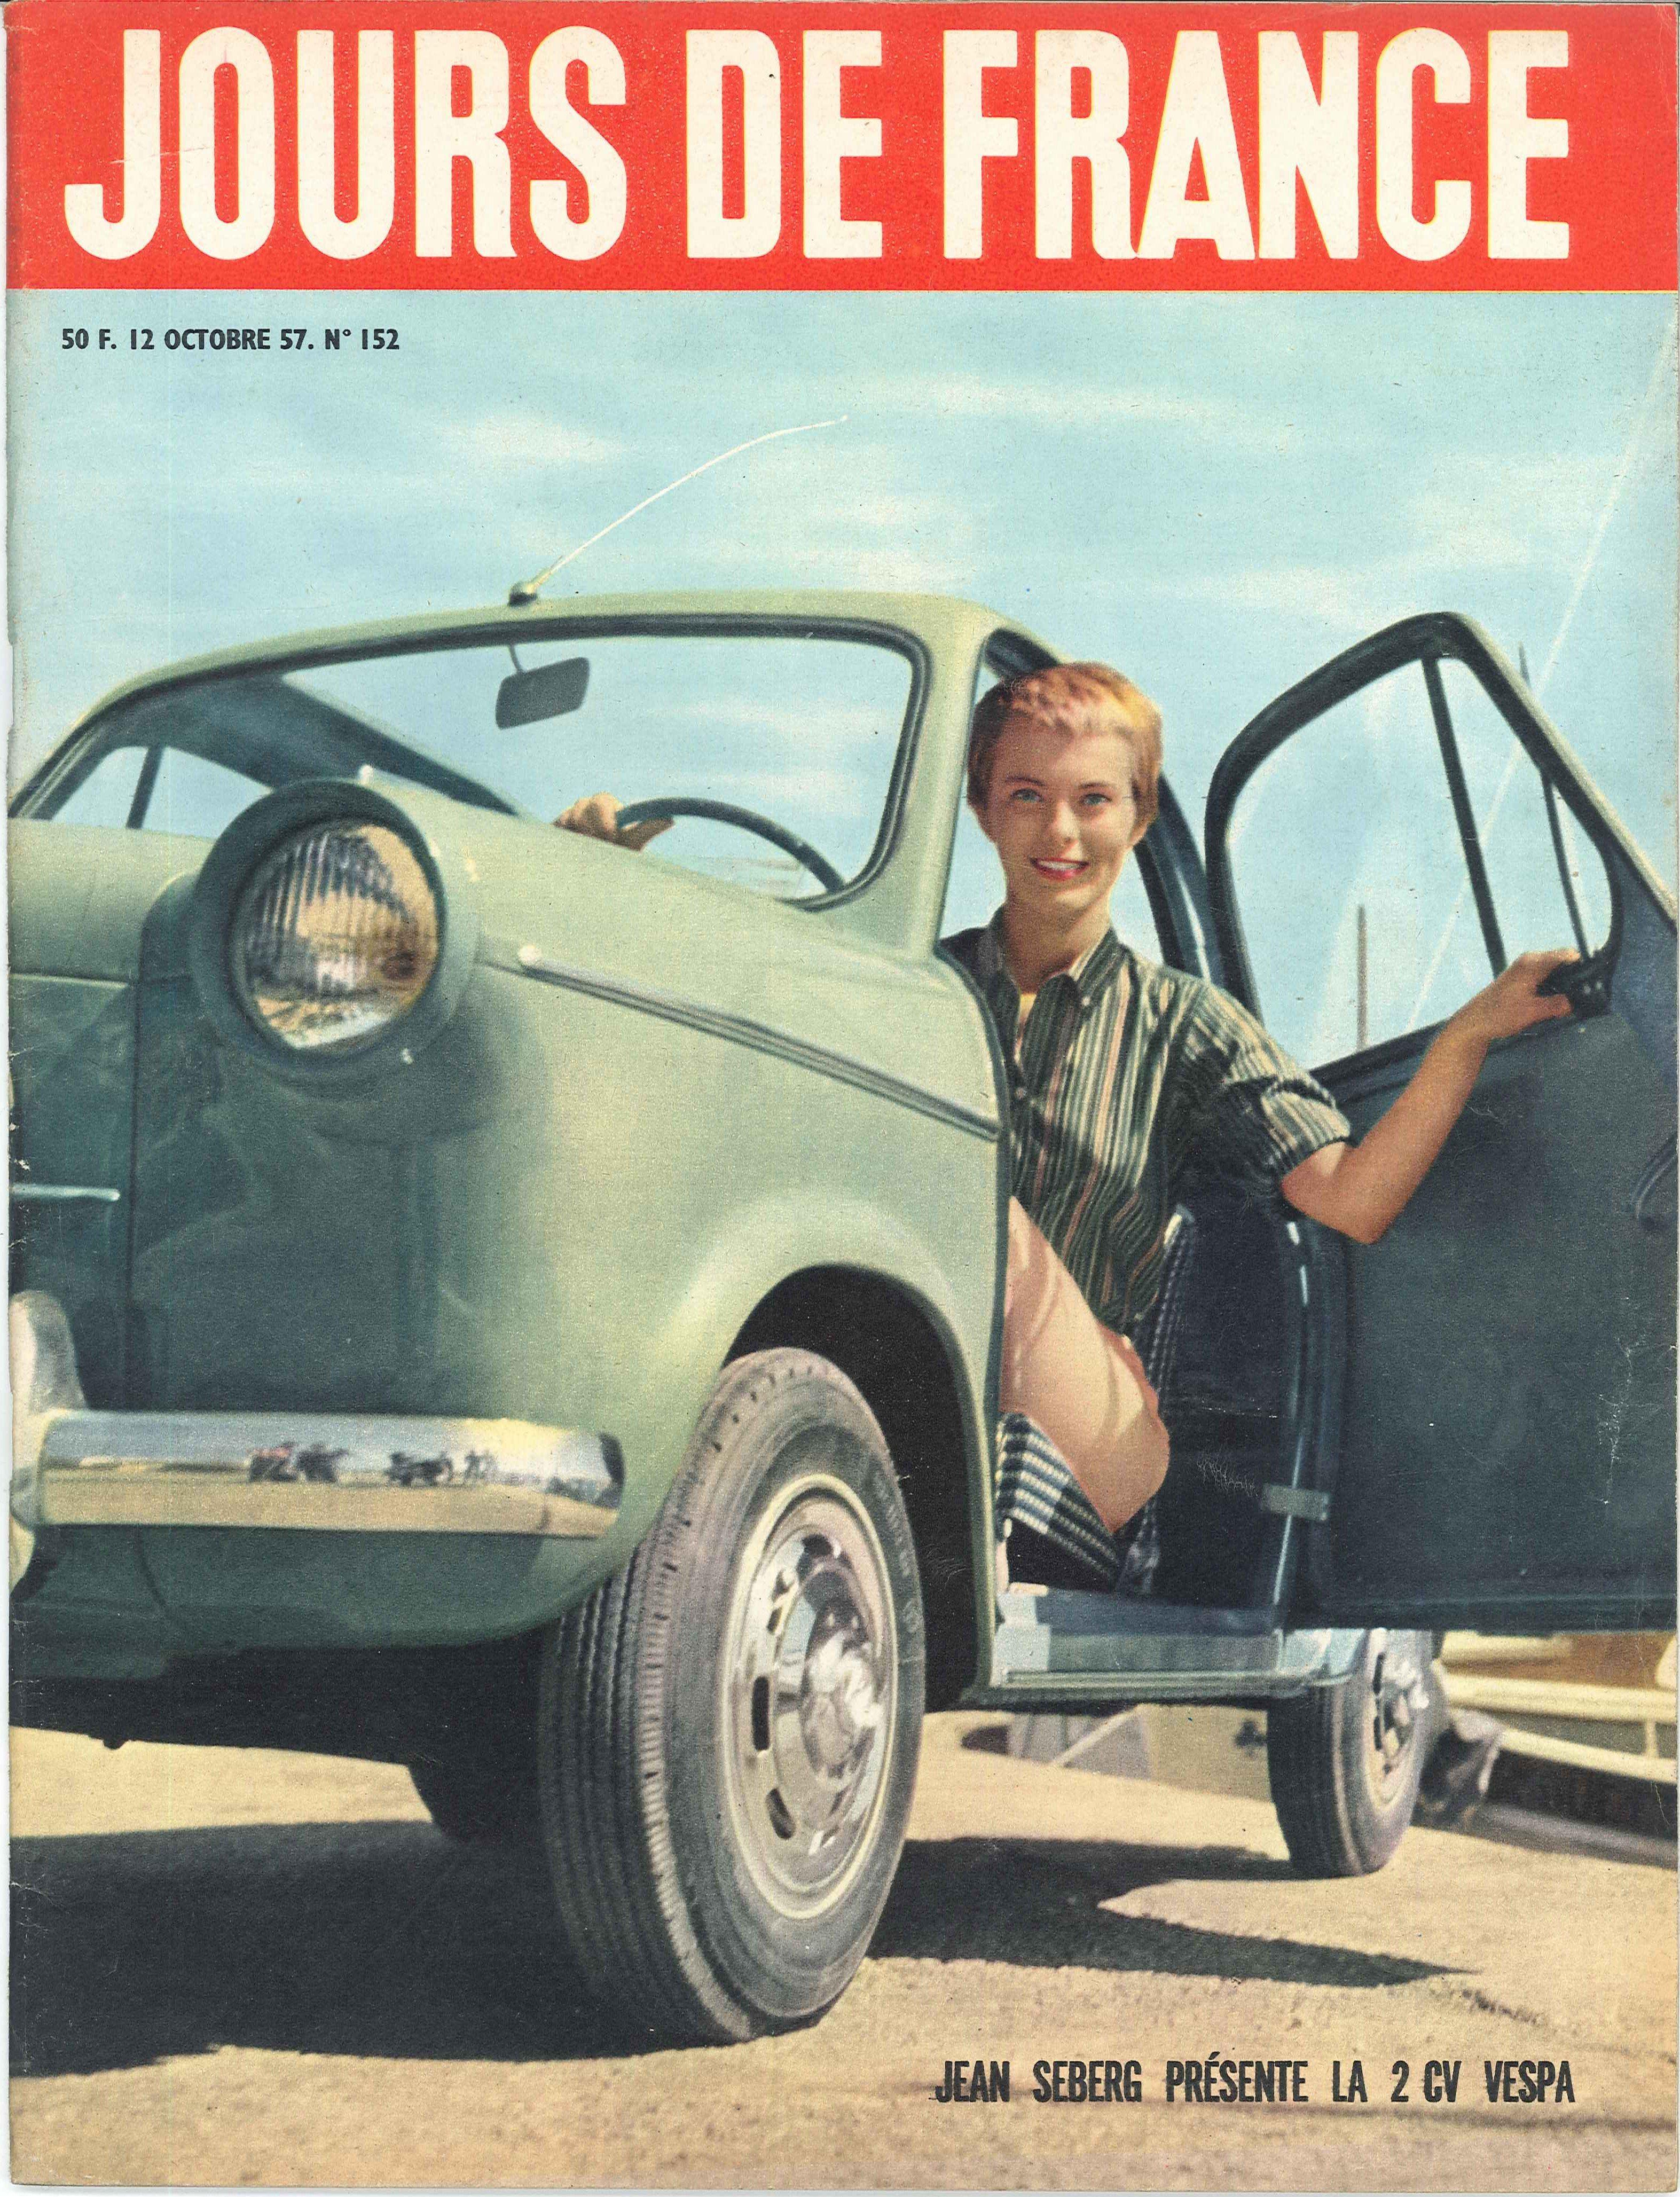 jean seberg pr sente la 2cv vespa jours de france n 152 12 octobre 1957 automobiles pinterest. Black Bedroom Furniture Sets. Home Design Ideas